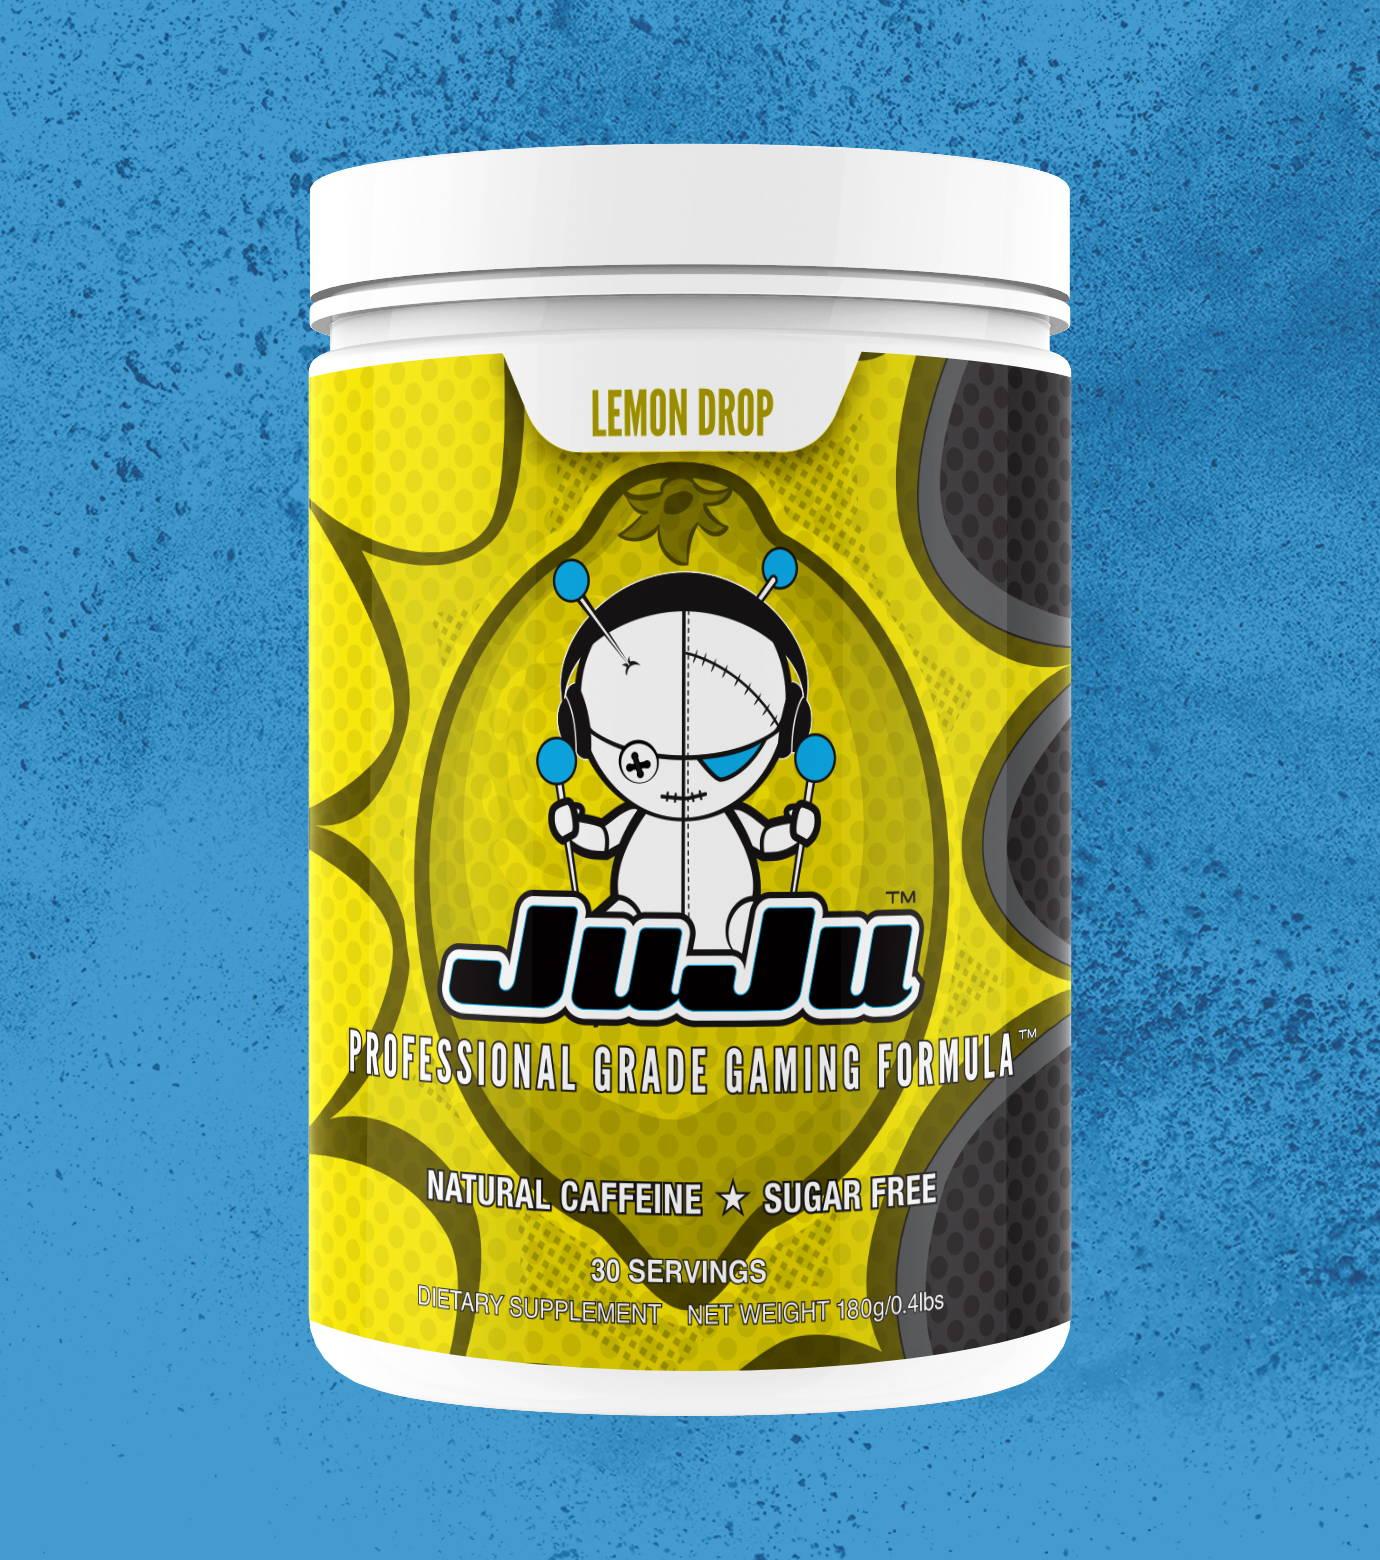 JuJu Lemon Drop Gaming Formula